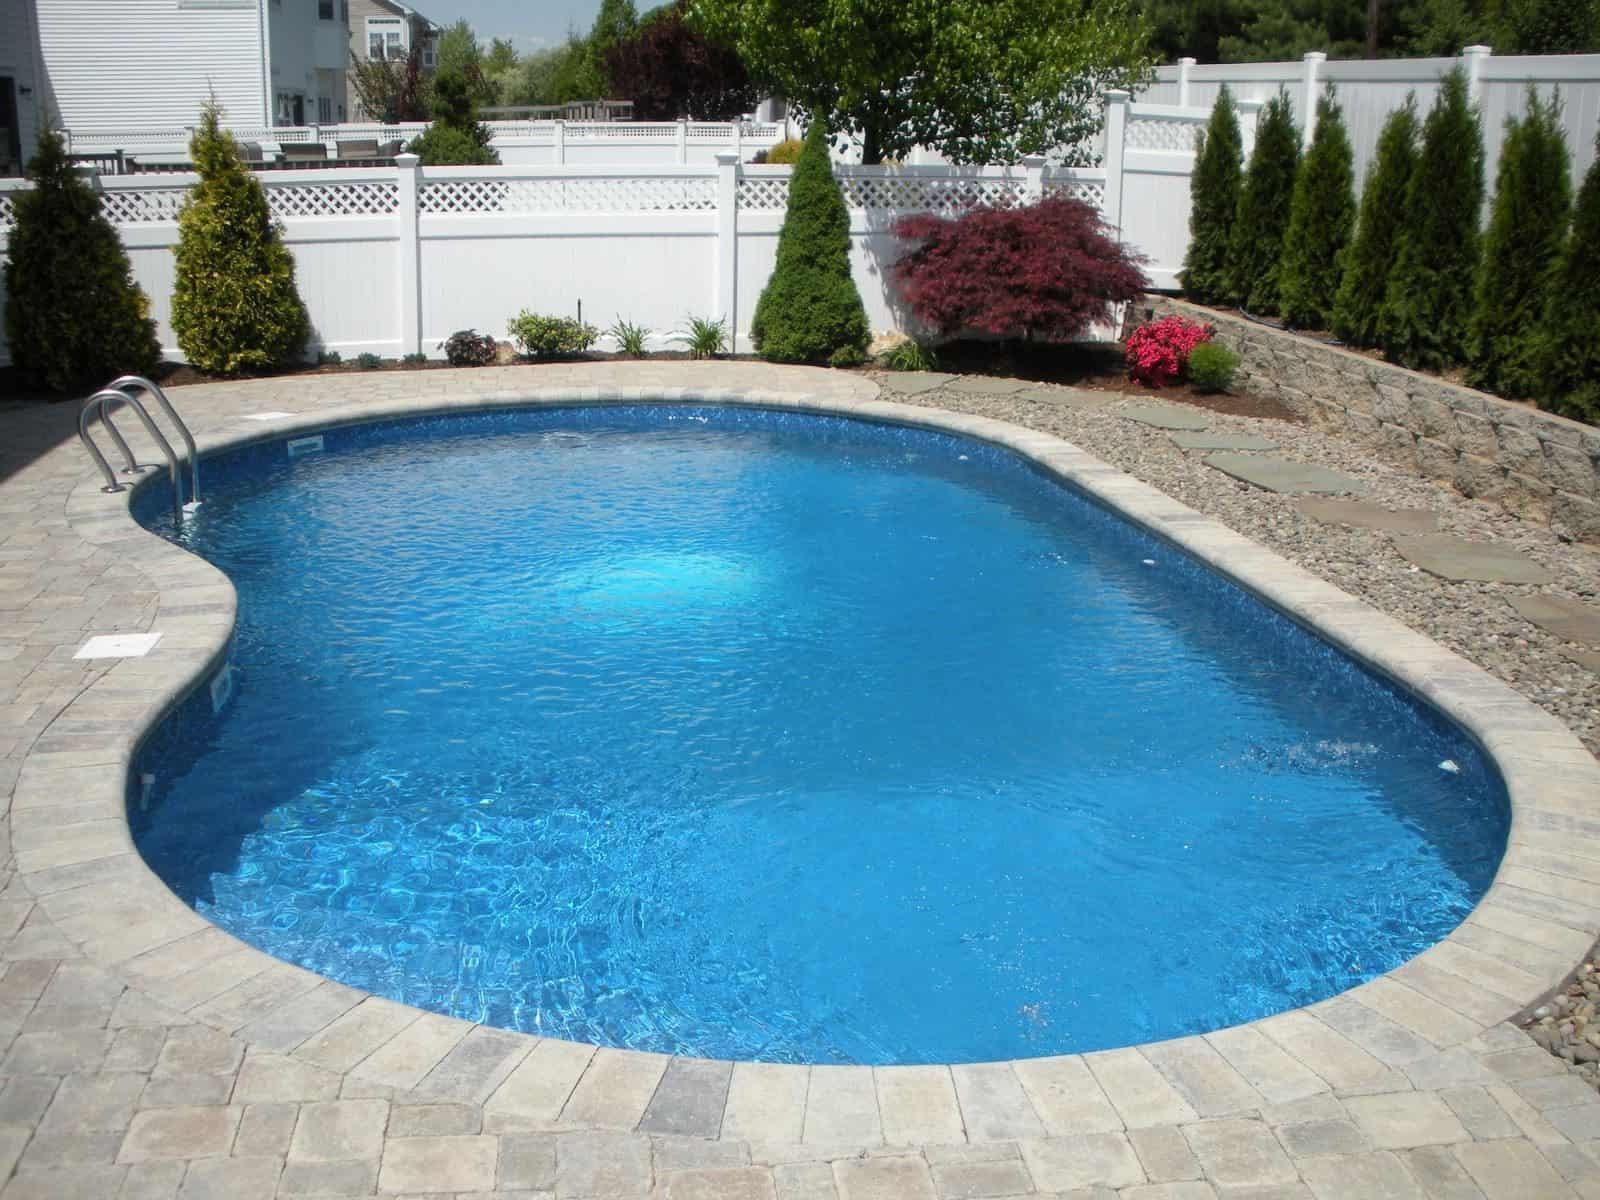 16' x 32' free form pool - Melville, Long Island NY